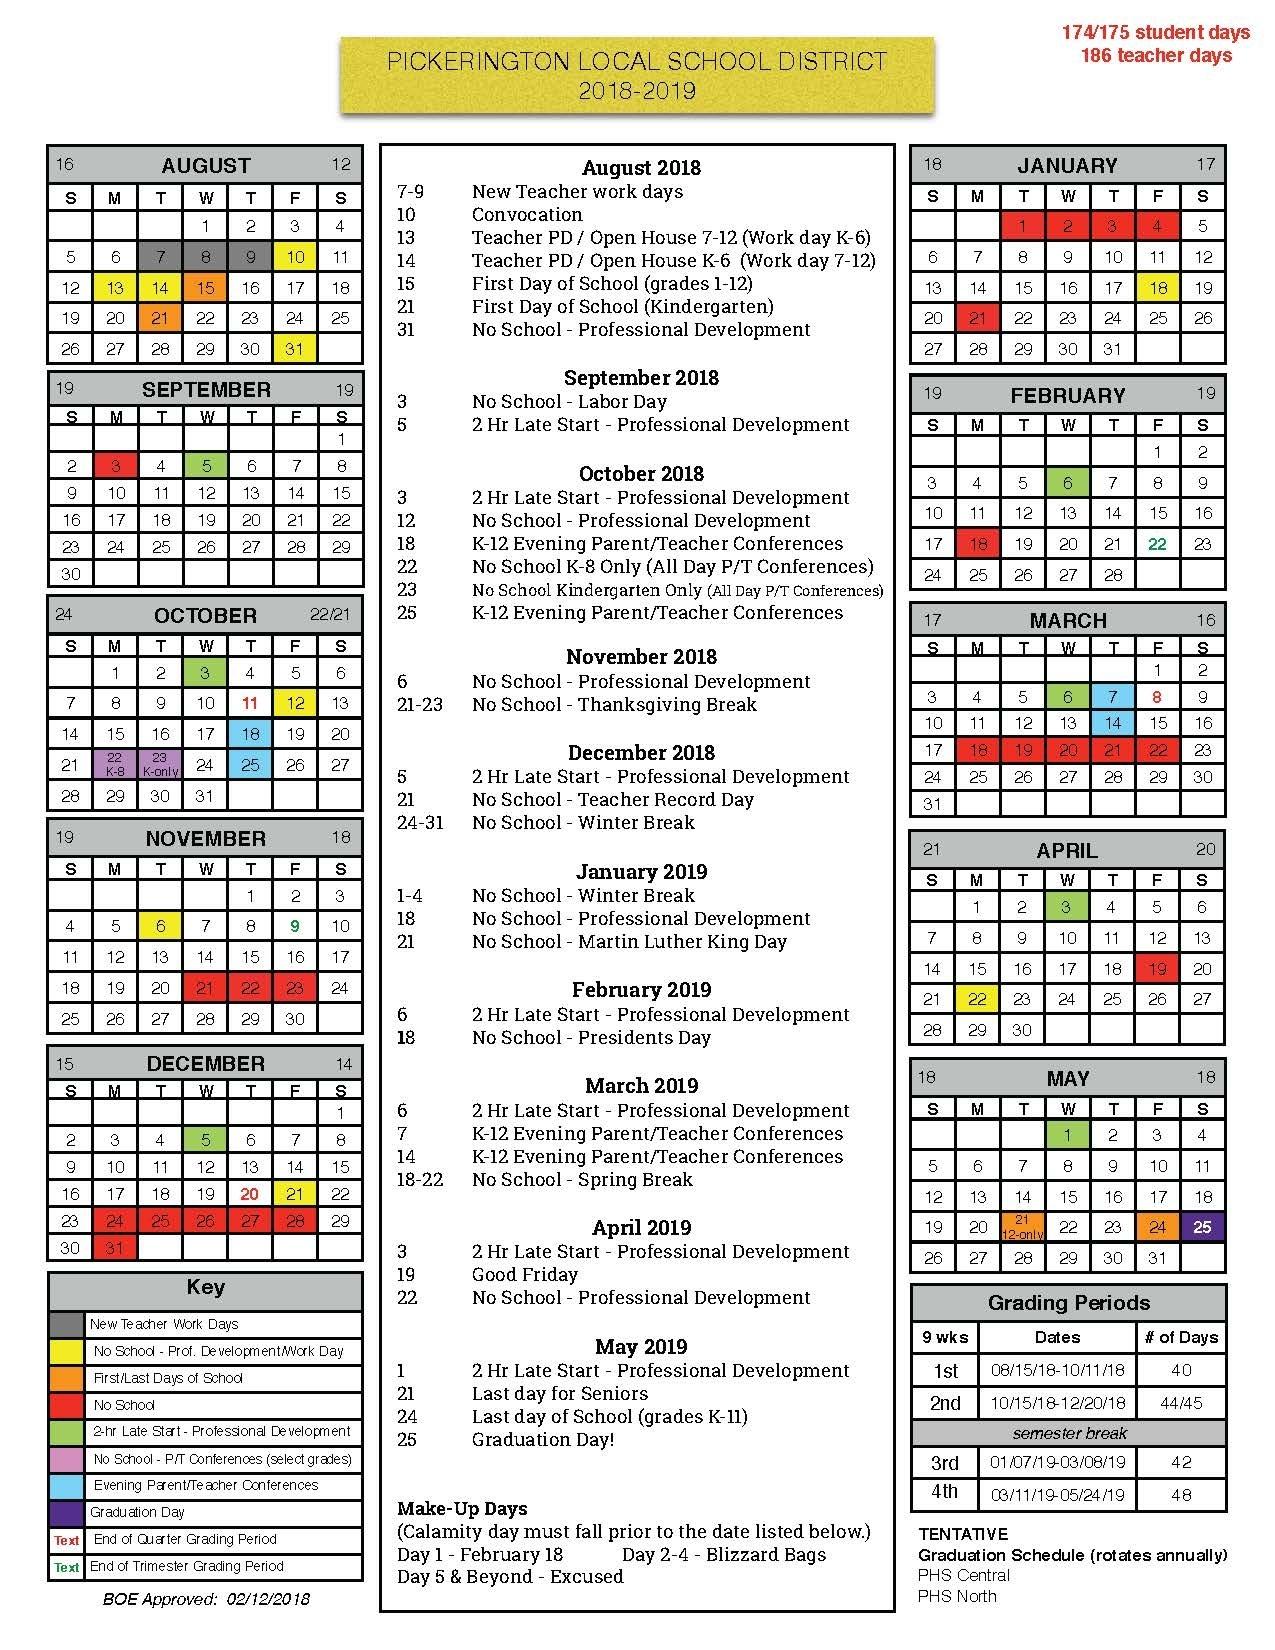 Board Of Education Approves 2018-19 Calendar - Pickerington Local School Calendar District 2